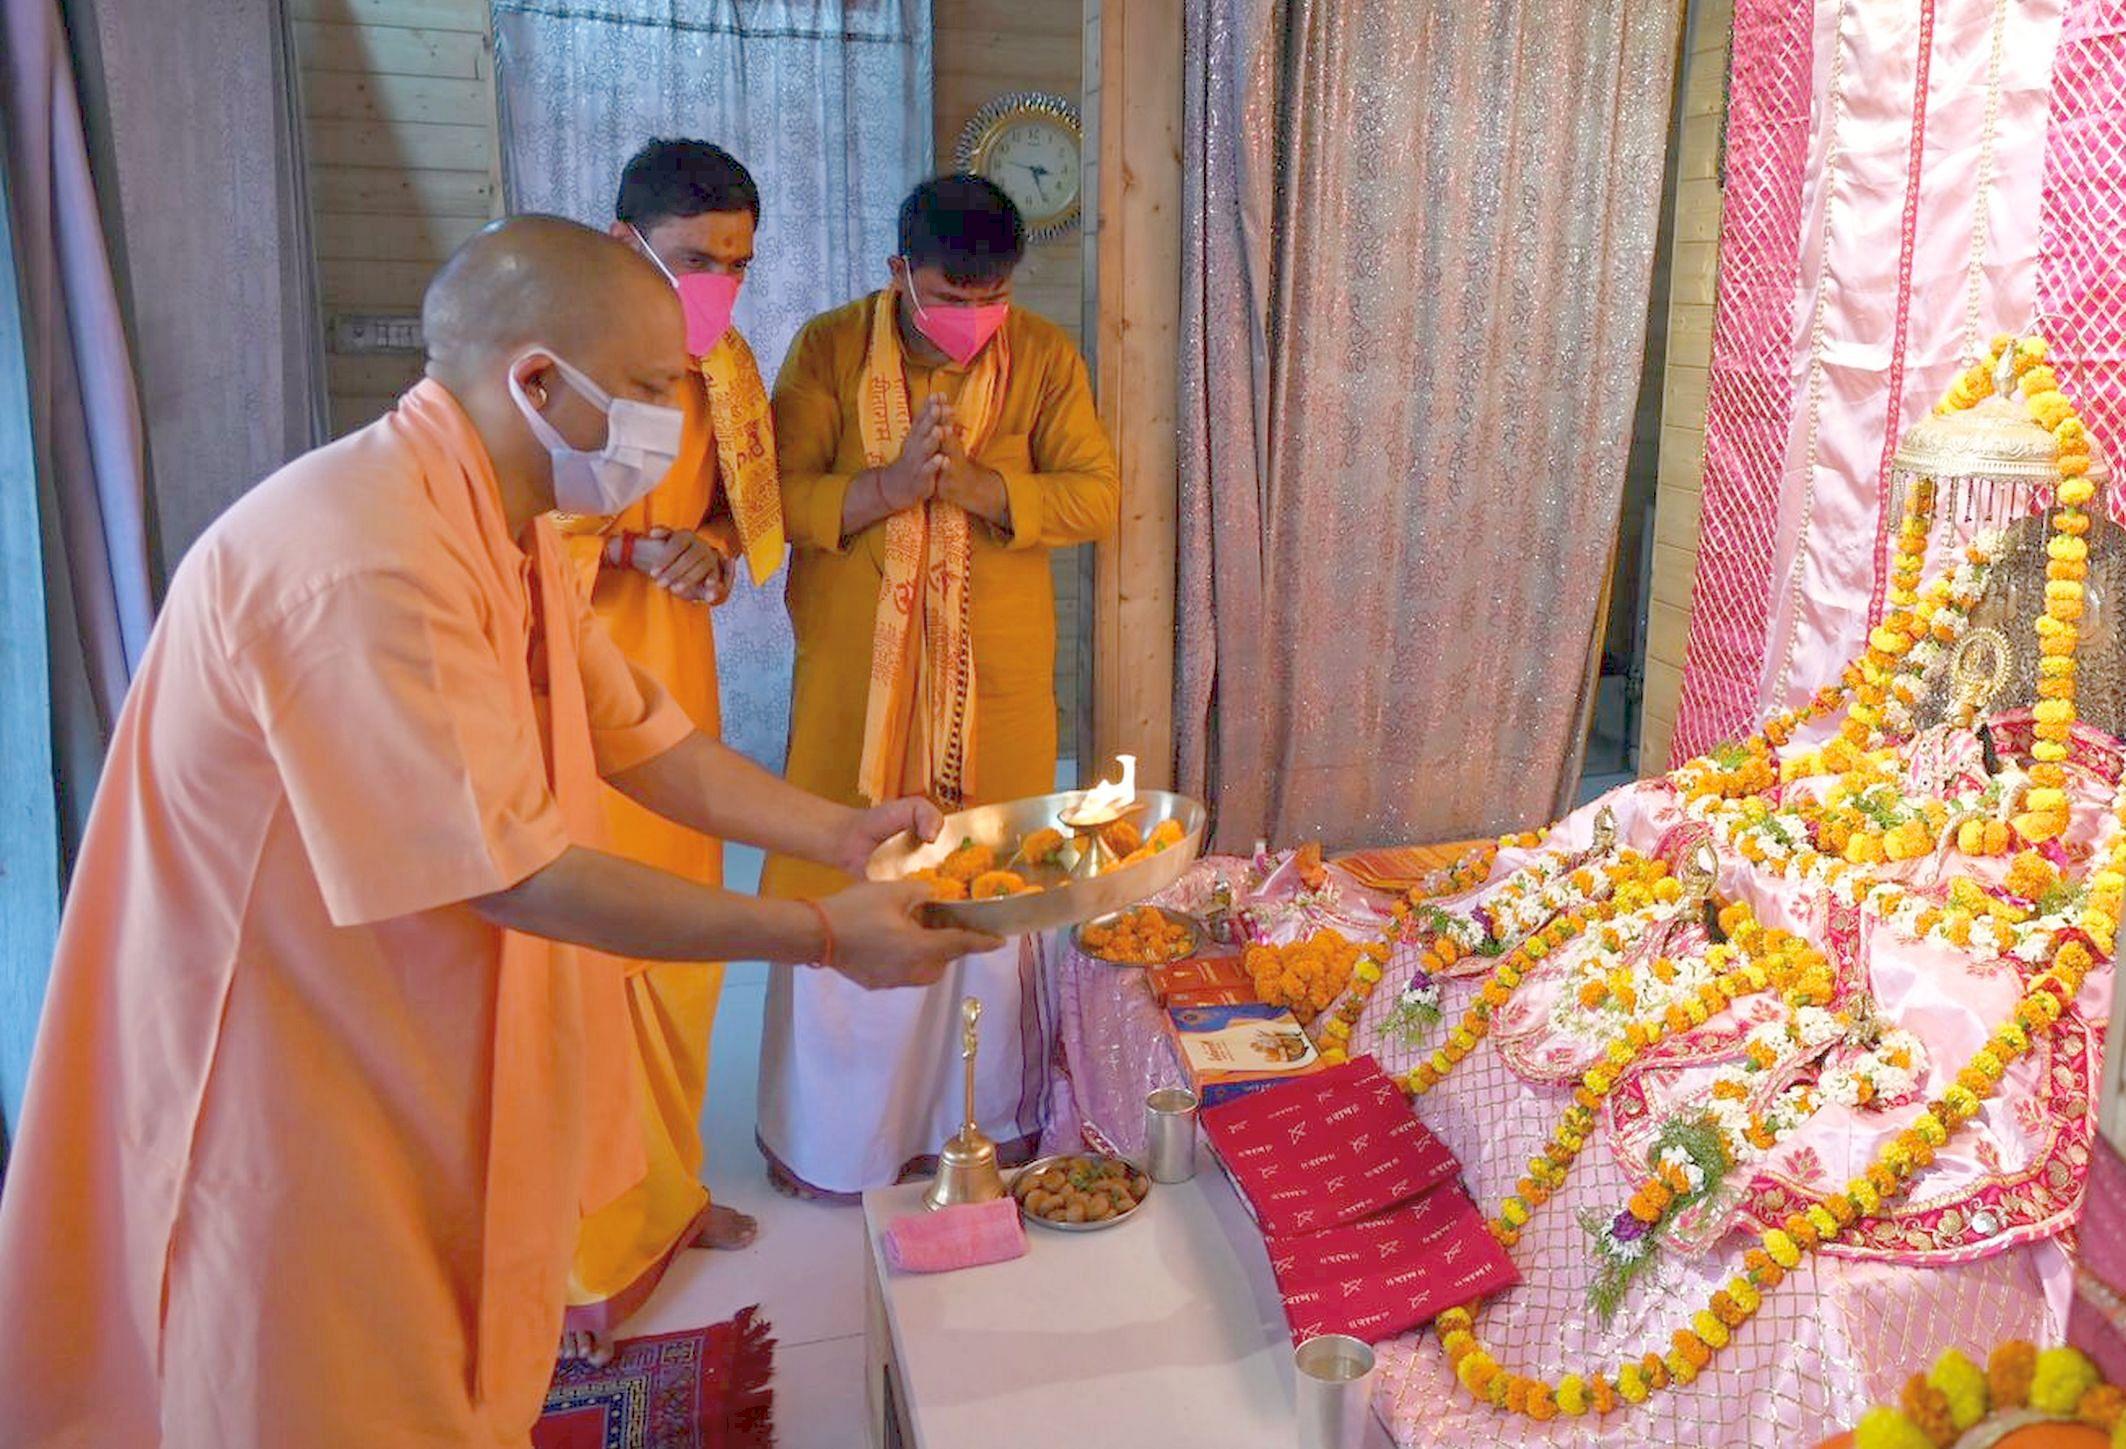 अयोध्या-रामलला का दर्शन करने के बाद आरती करते मुख्यमंत्री योगीआदित्यनाथ